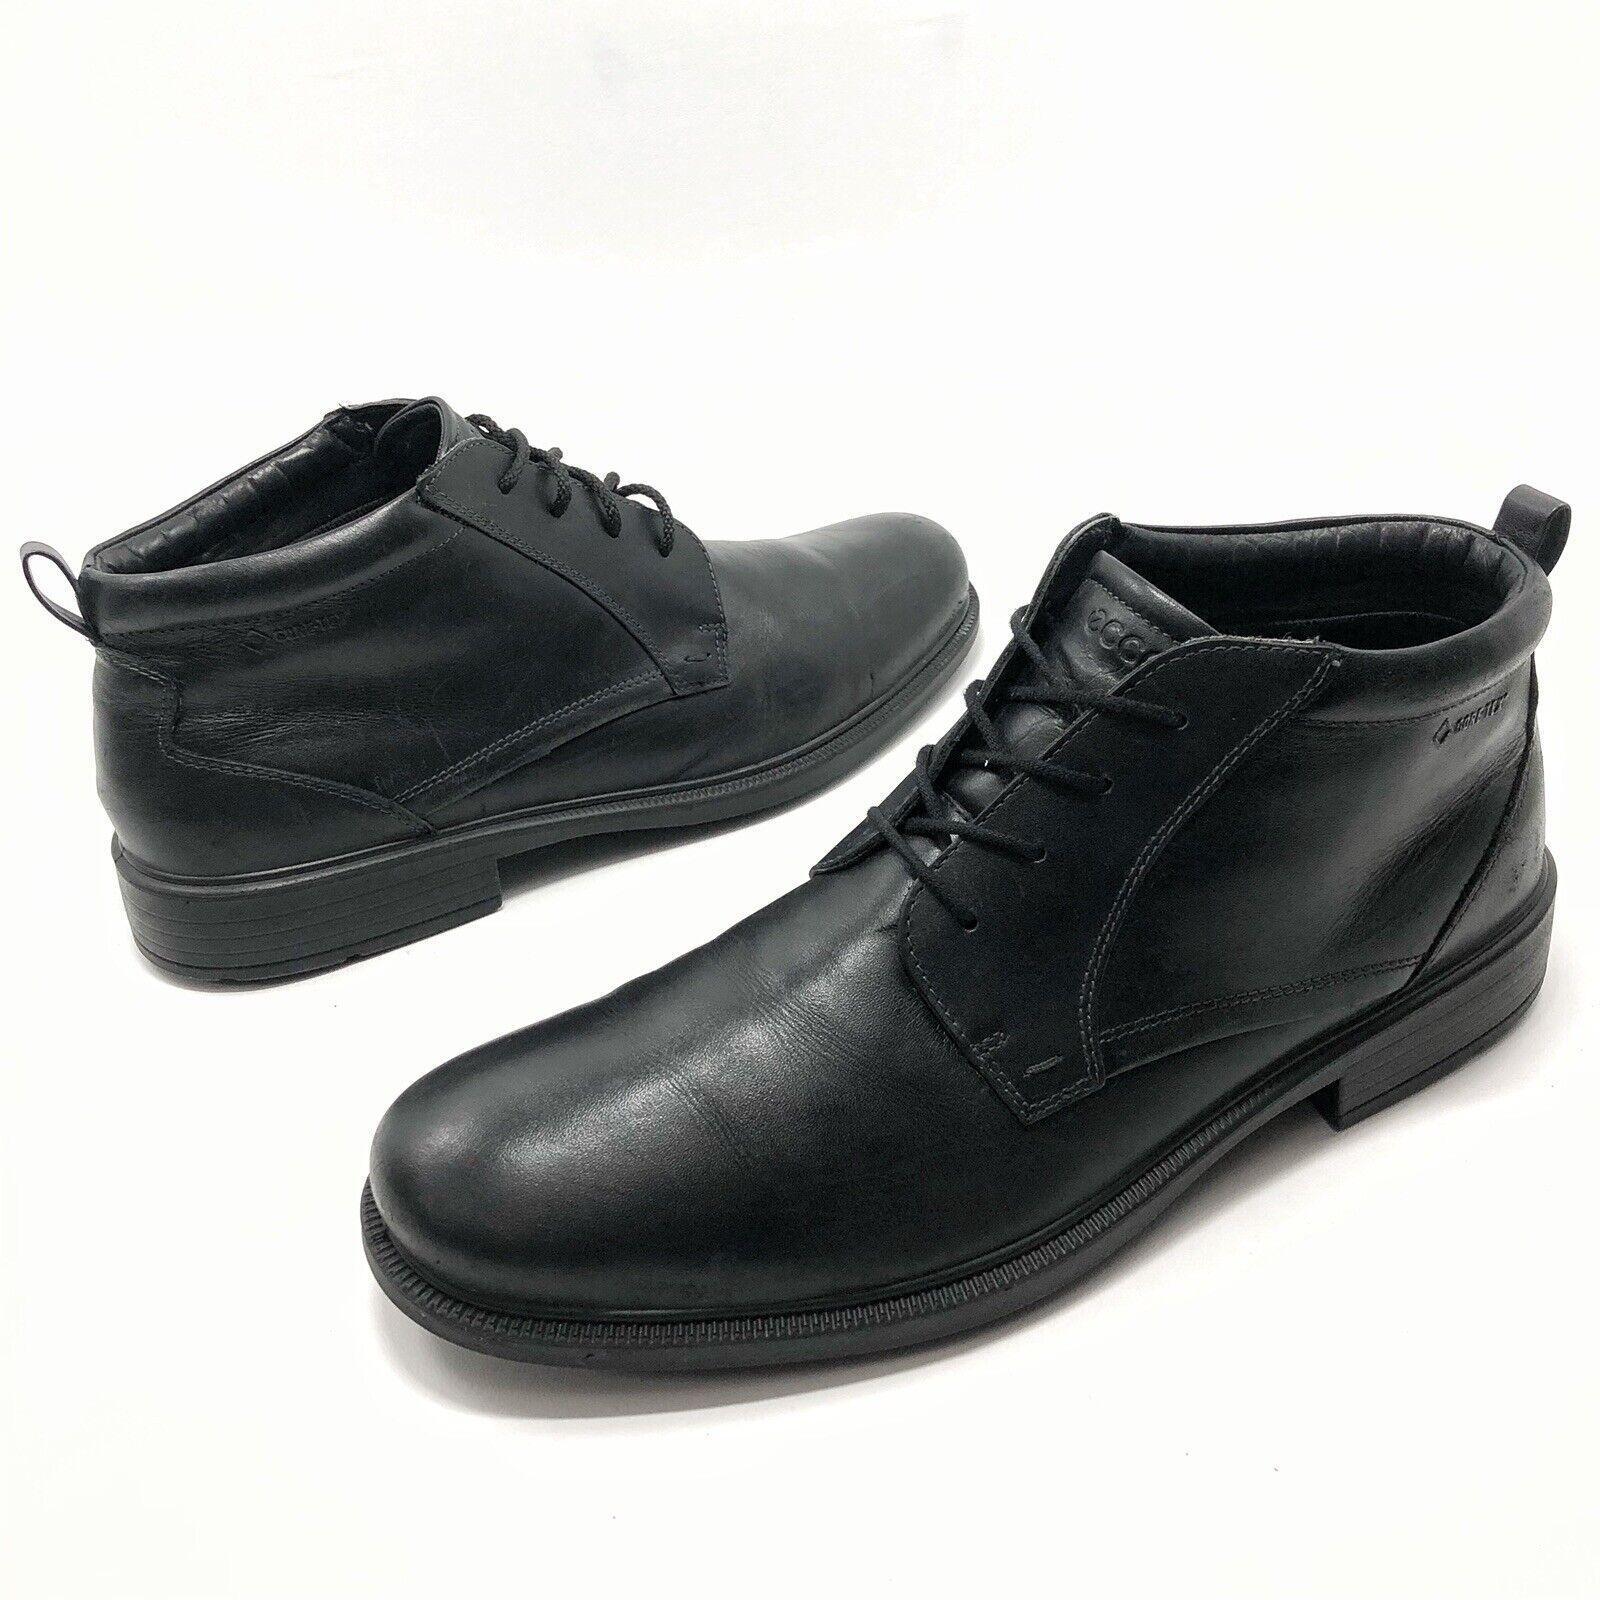 ✅❤️✅8 ECCO Chukka Ankle Boots Mens EU 46 US 12- 12.5 Black Leather Shoe Lace Up